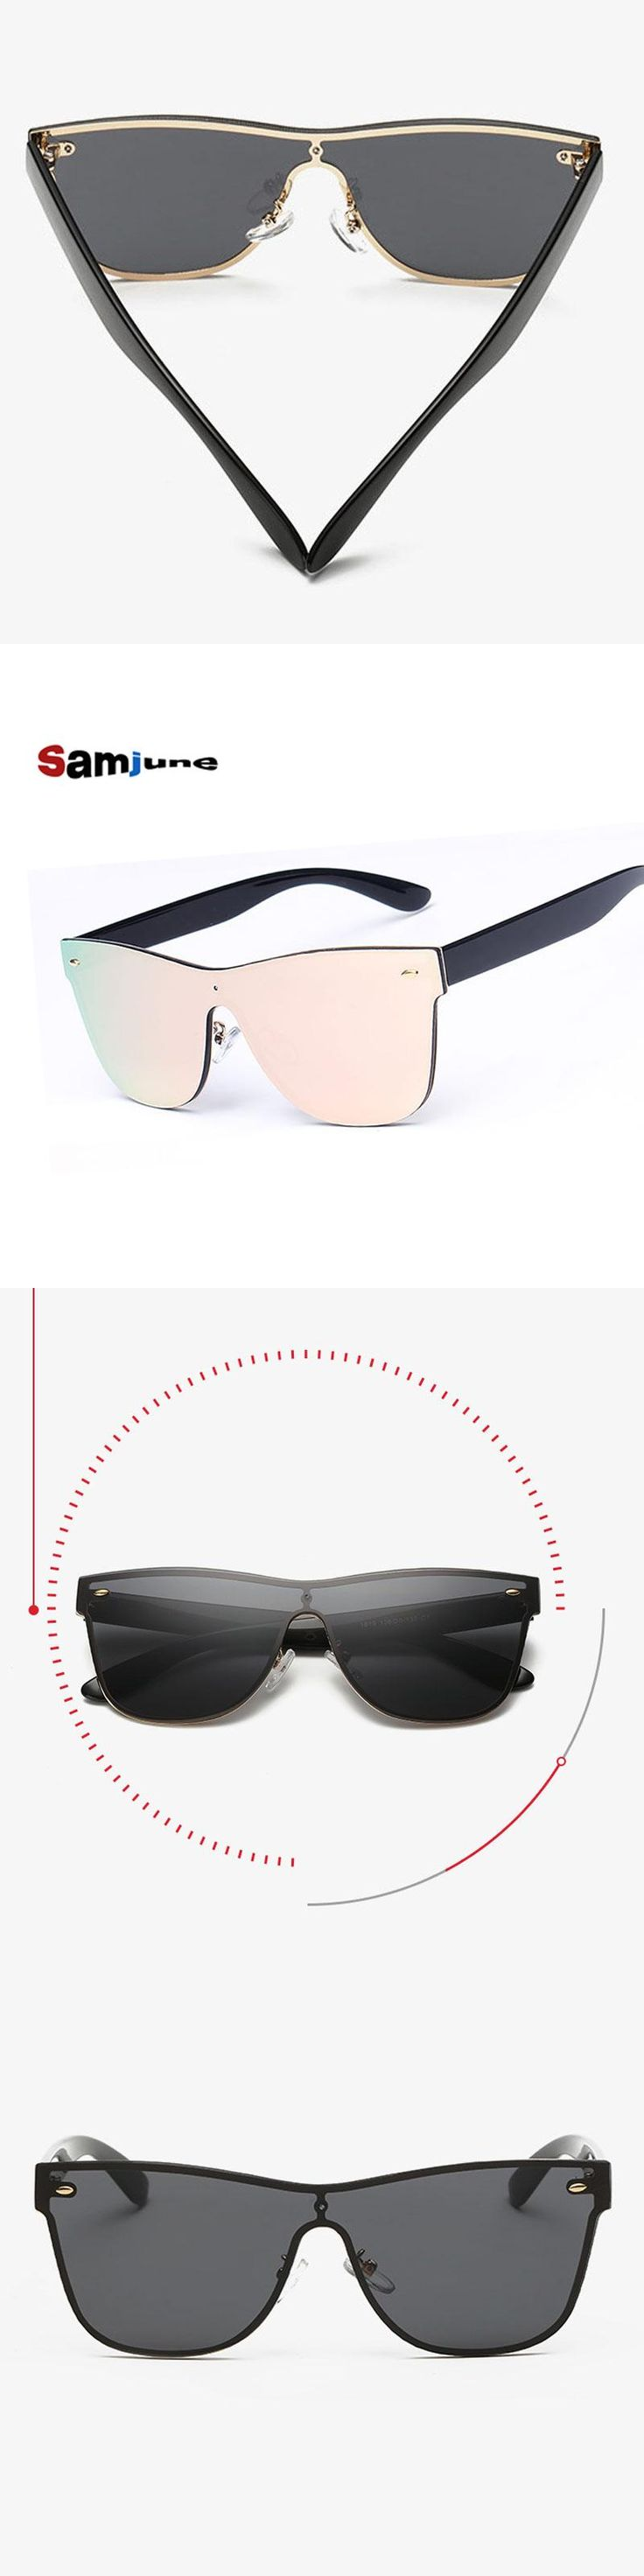 Mirror sunglasses women luxury sunglasses Conjoined Spectacle Lens brand designer Rimless oculos de sol sunglasses female